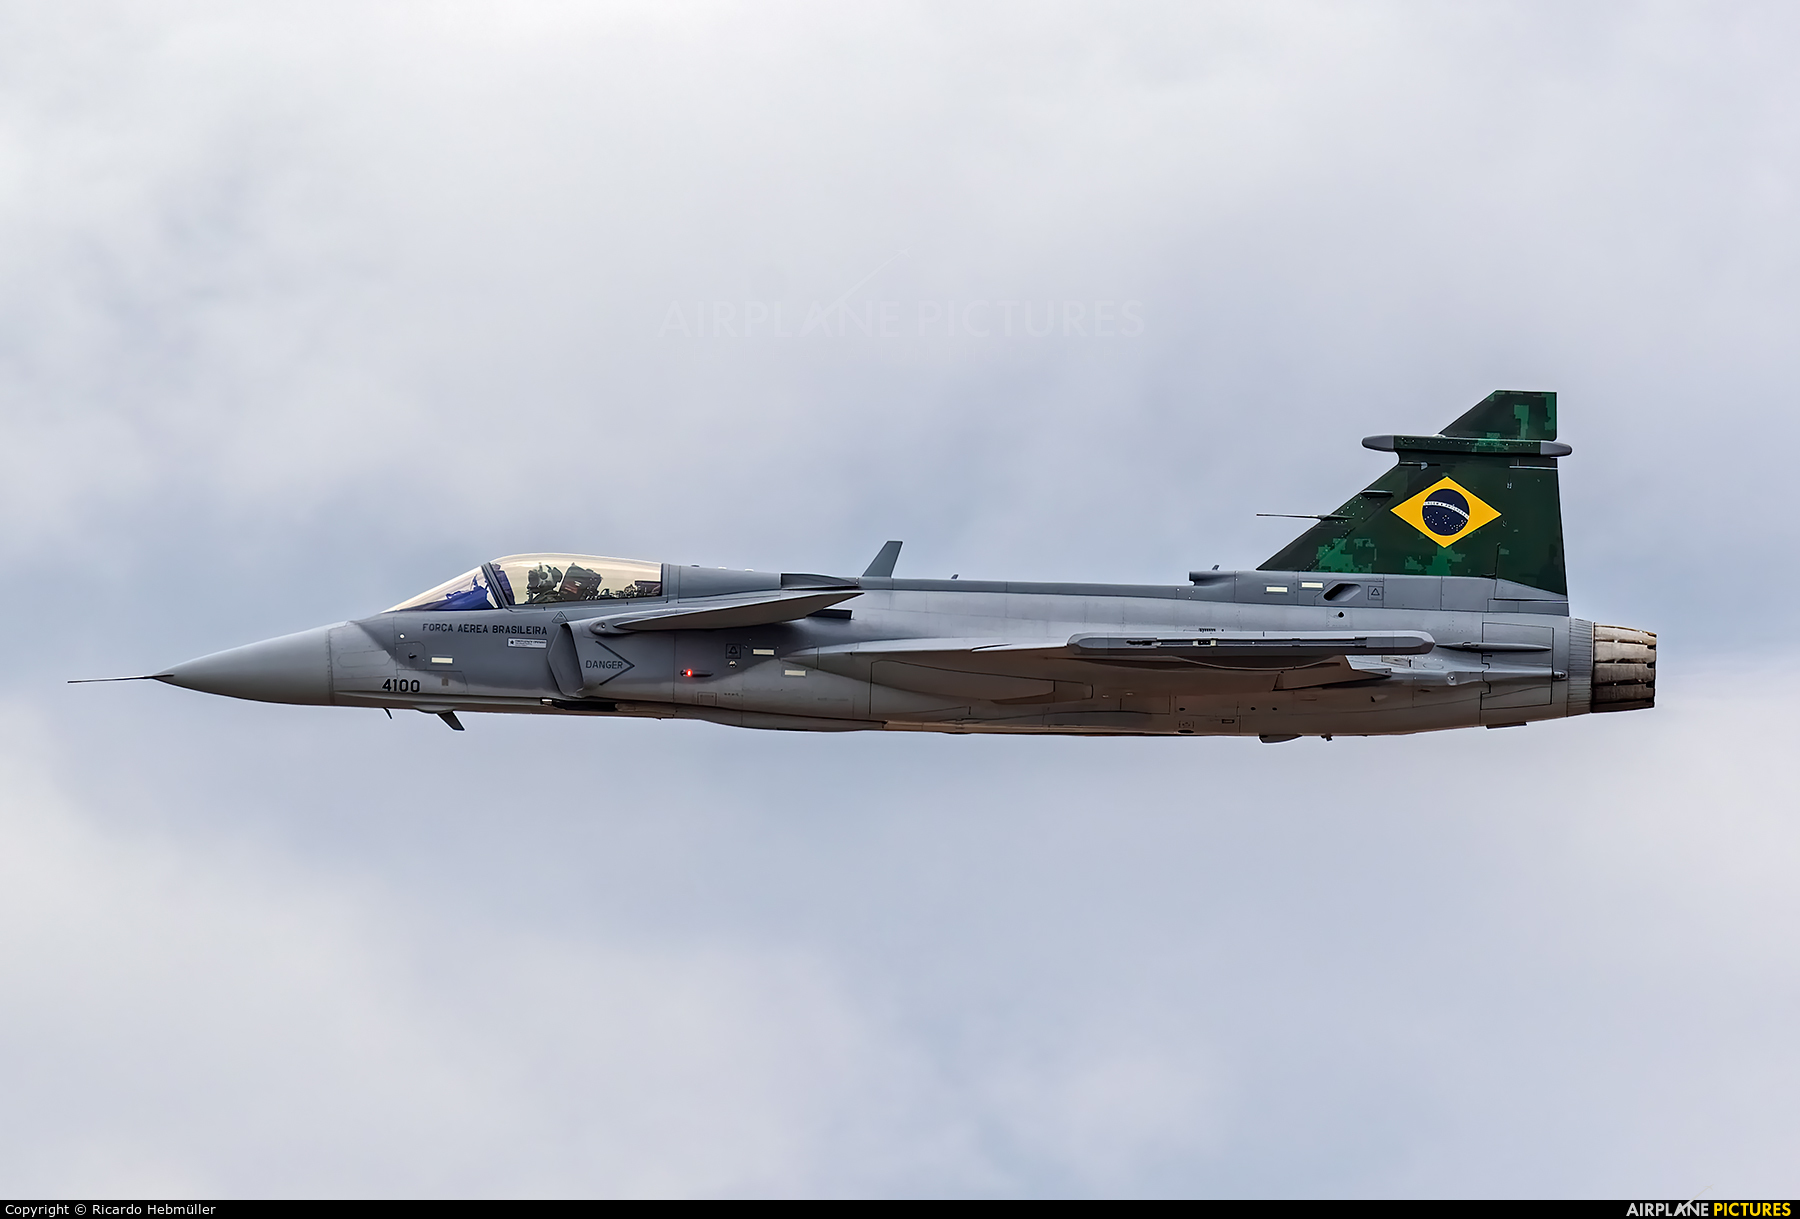 Brazil - Air Force 4100 aircraft at Brasília - Presidente Juscelino Kubitschek Intl